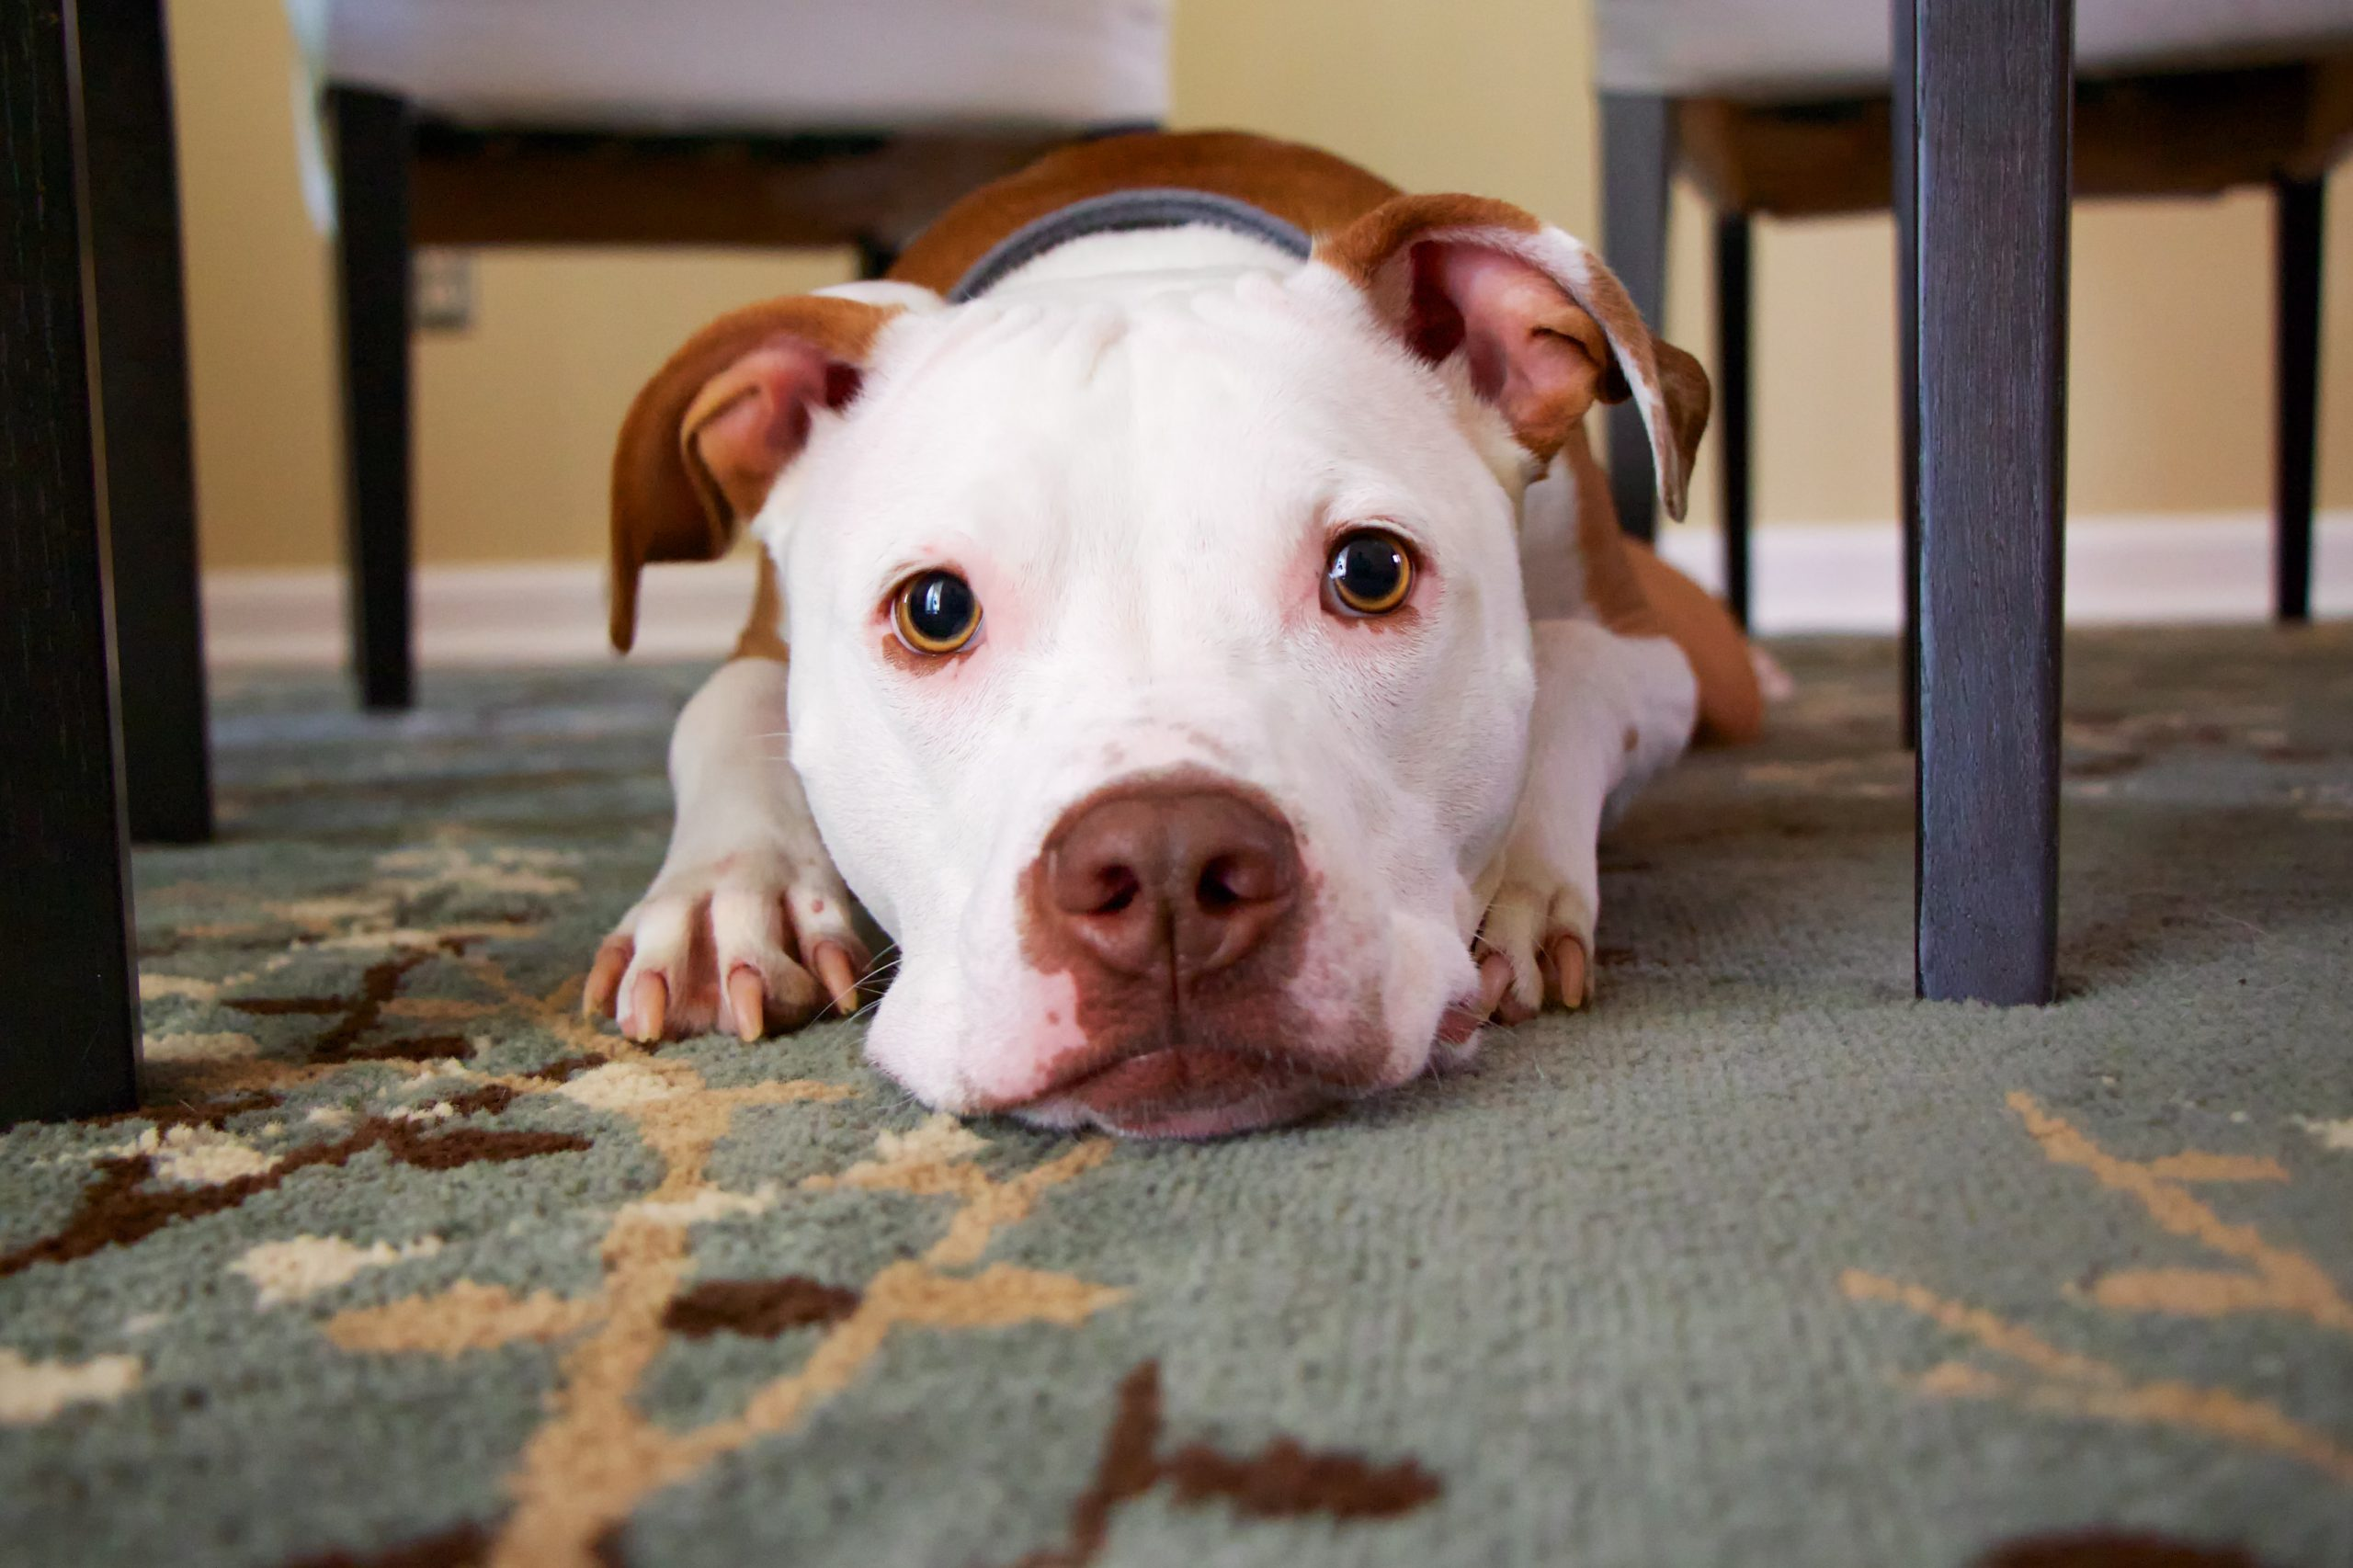 Scared dog lying on rug